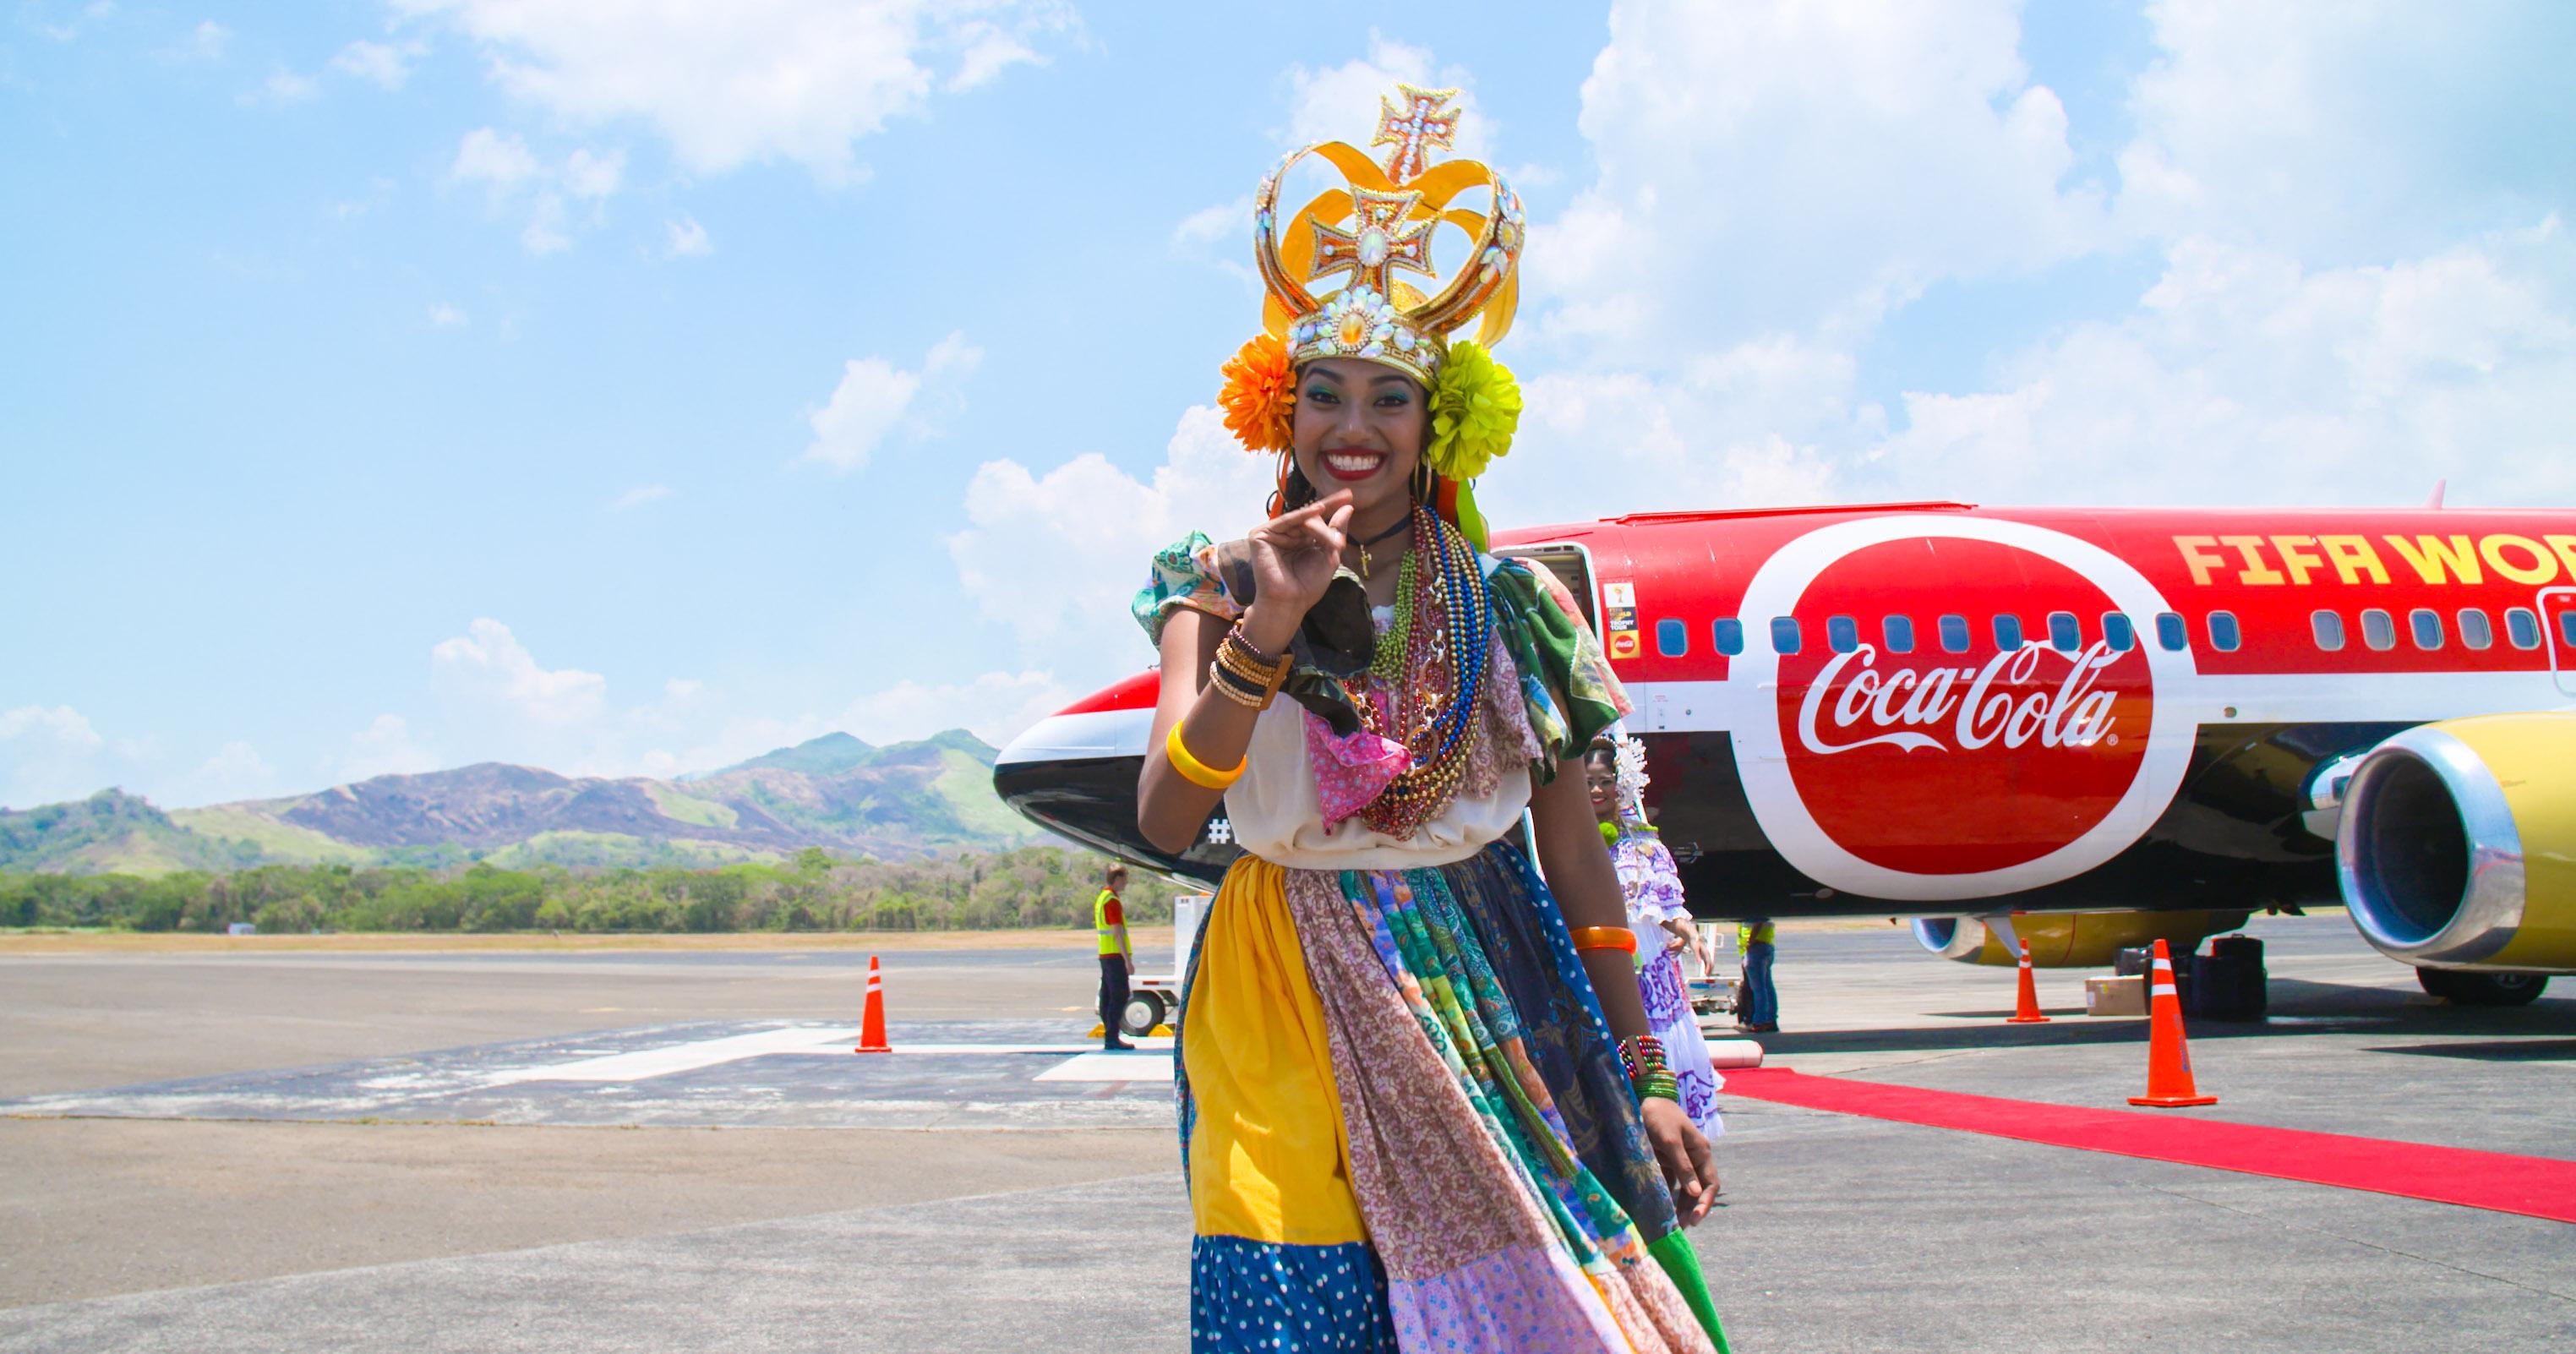 Fantastic Coca Cola World Cup 2018 - coca-cola-trophy-tour-panama-4_g6zt4dbsayf81tqlv8uz71elk  Image_678145 .jpg?w\u003d3048\u0026h\u003d1714\u0026quality\u003d100\u0026w\u003d960\u0026quality\u003d70